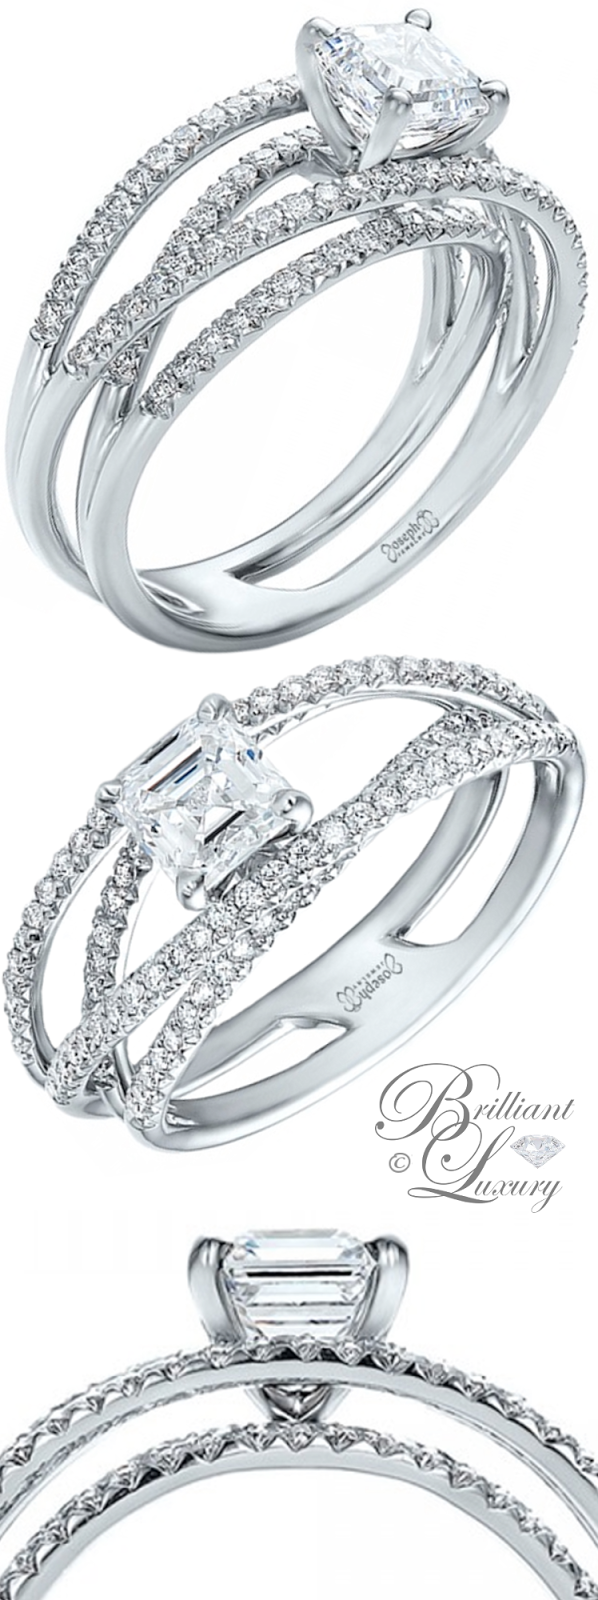 Brilliant Luxury ♦ Joseph Jewelry Custom Pave Diamond Multi-Band Engagement Ring